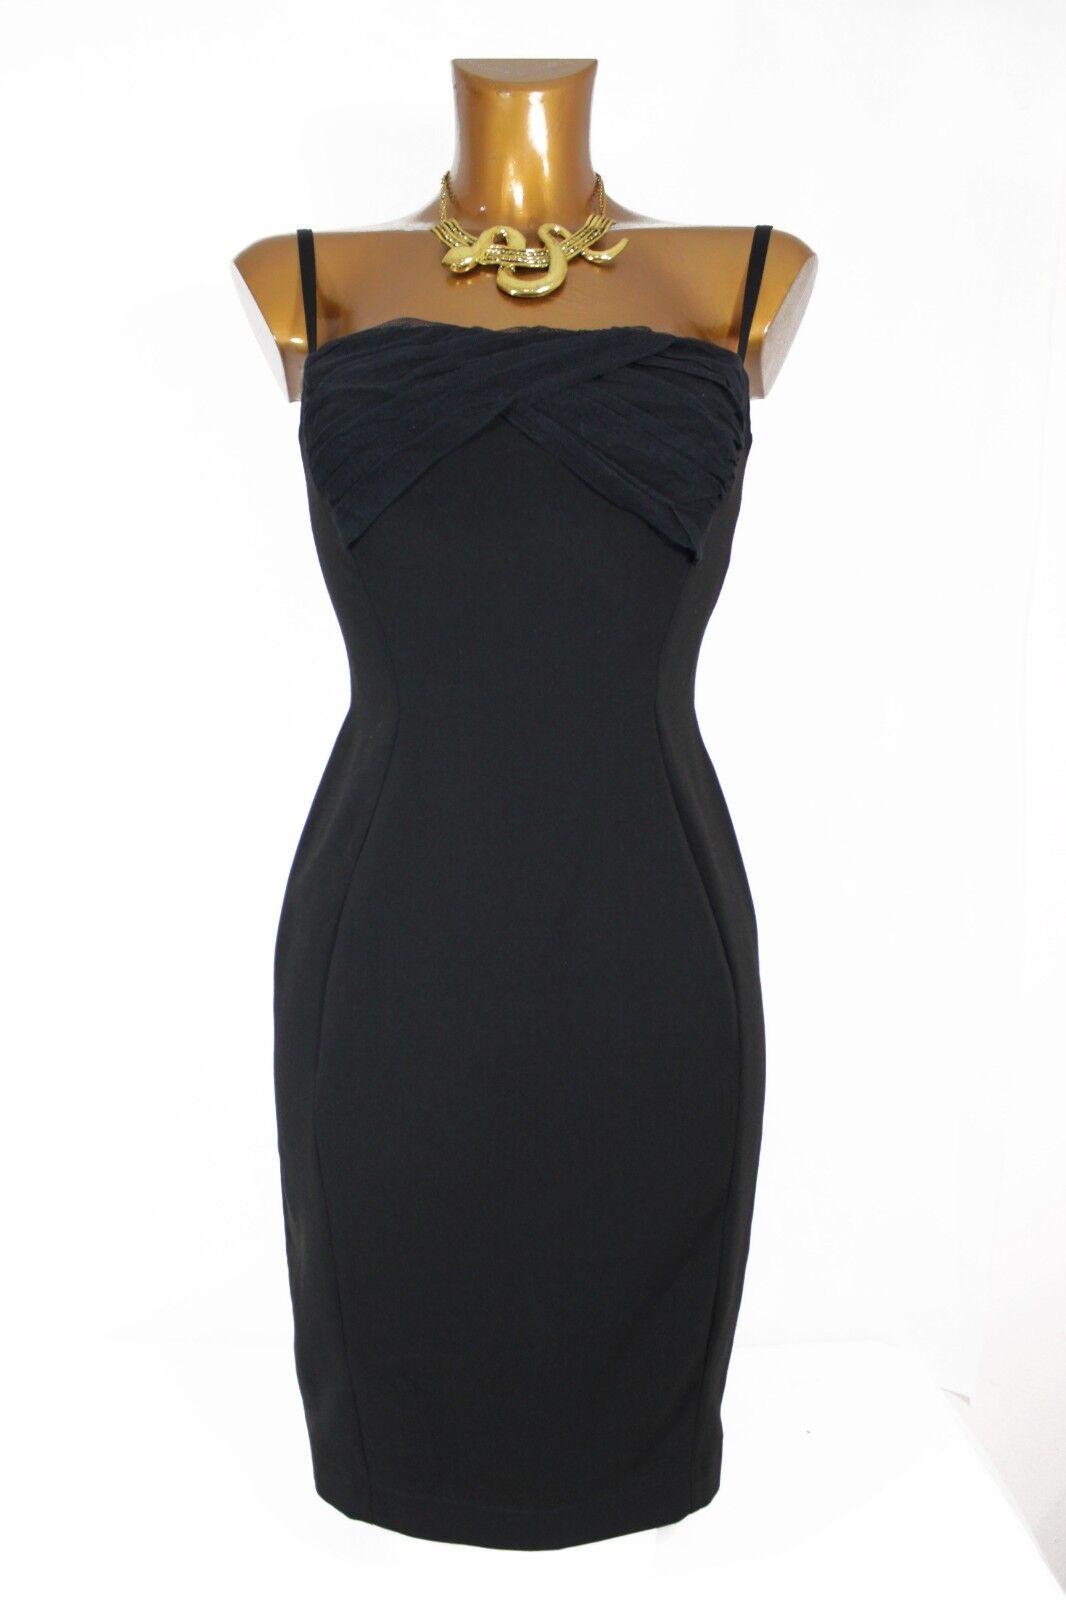 NEW WITH TAGS genuine Roberto Cavalli schwarz pencil dress Größe 40